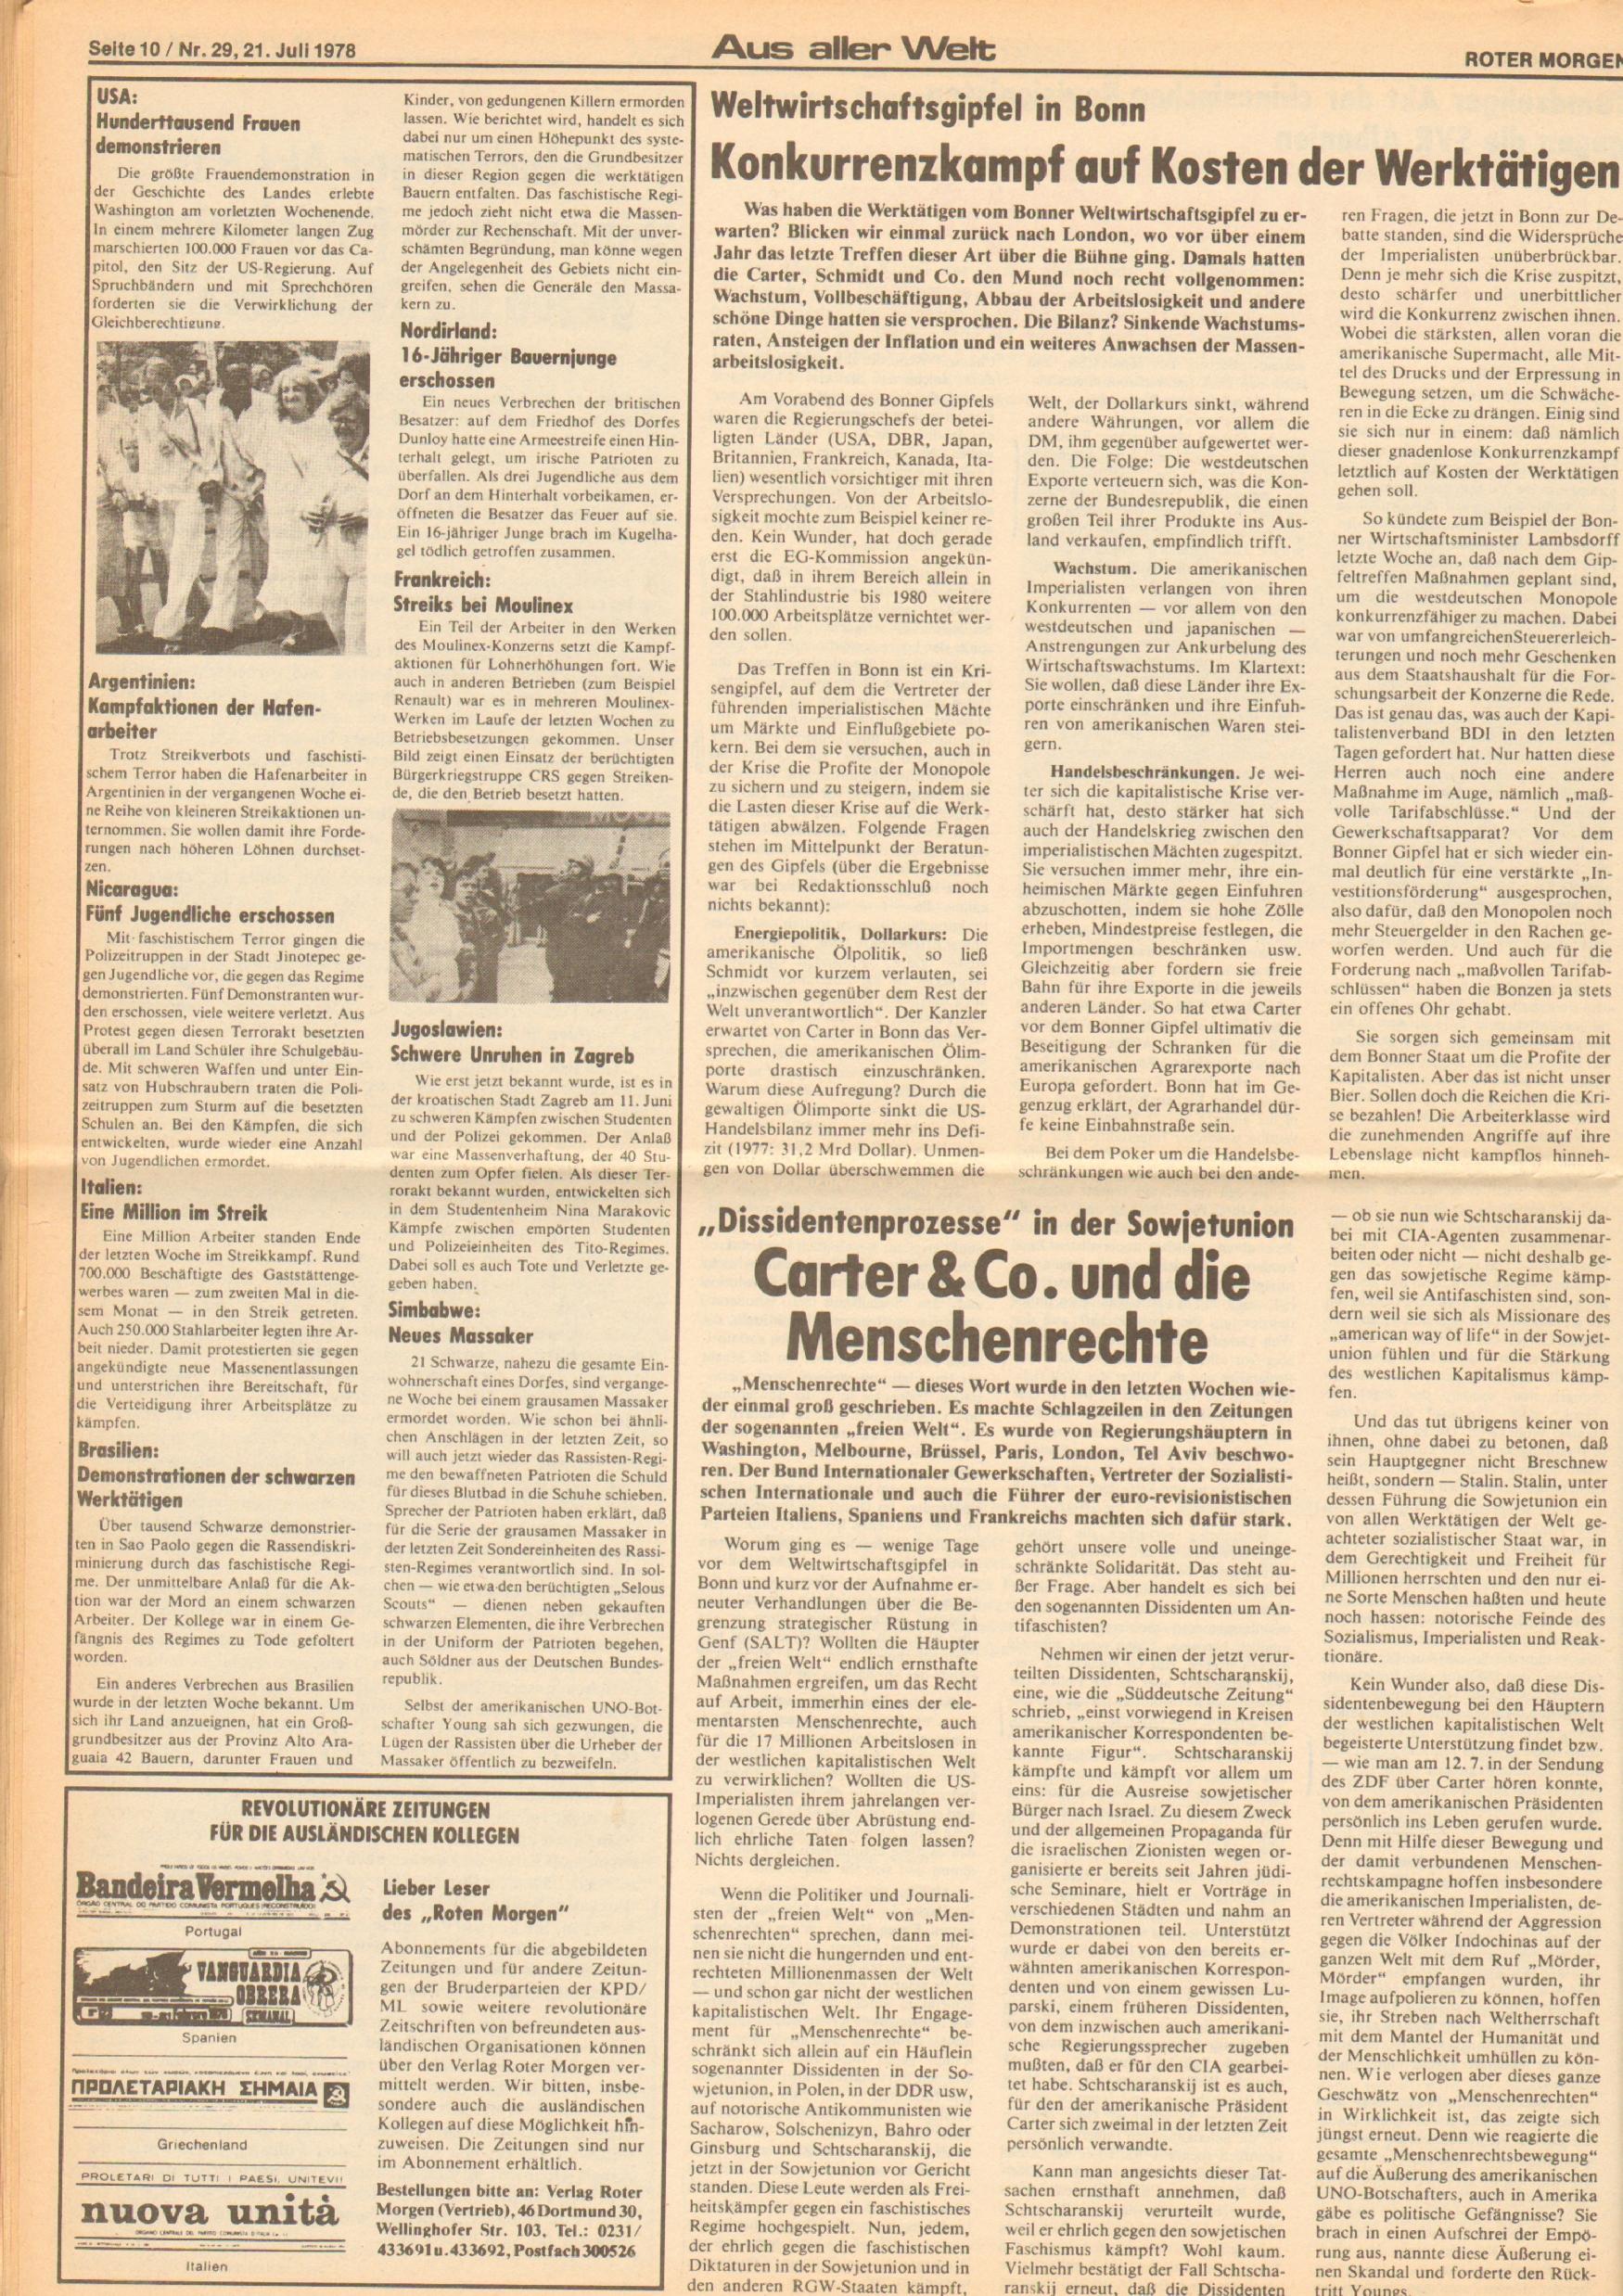 Roter Morgen, 12. Jg., 21. Juli 1978, Nr. 29, Seite 10